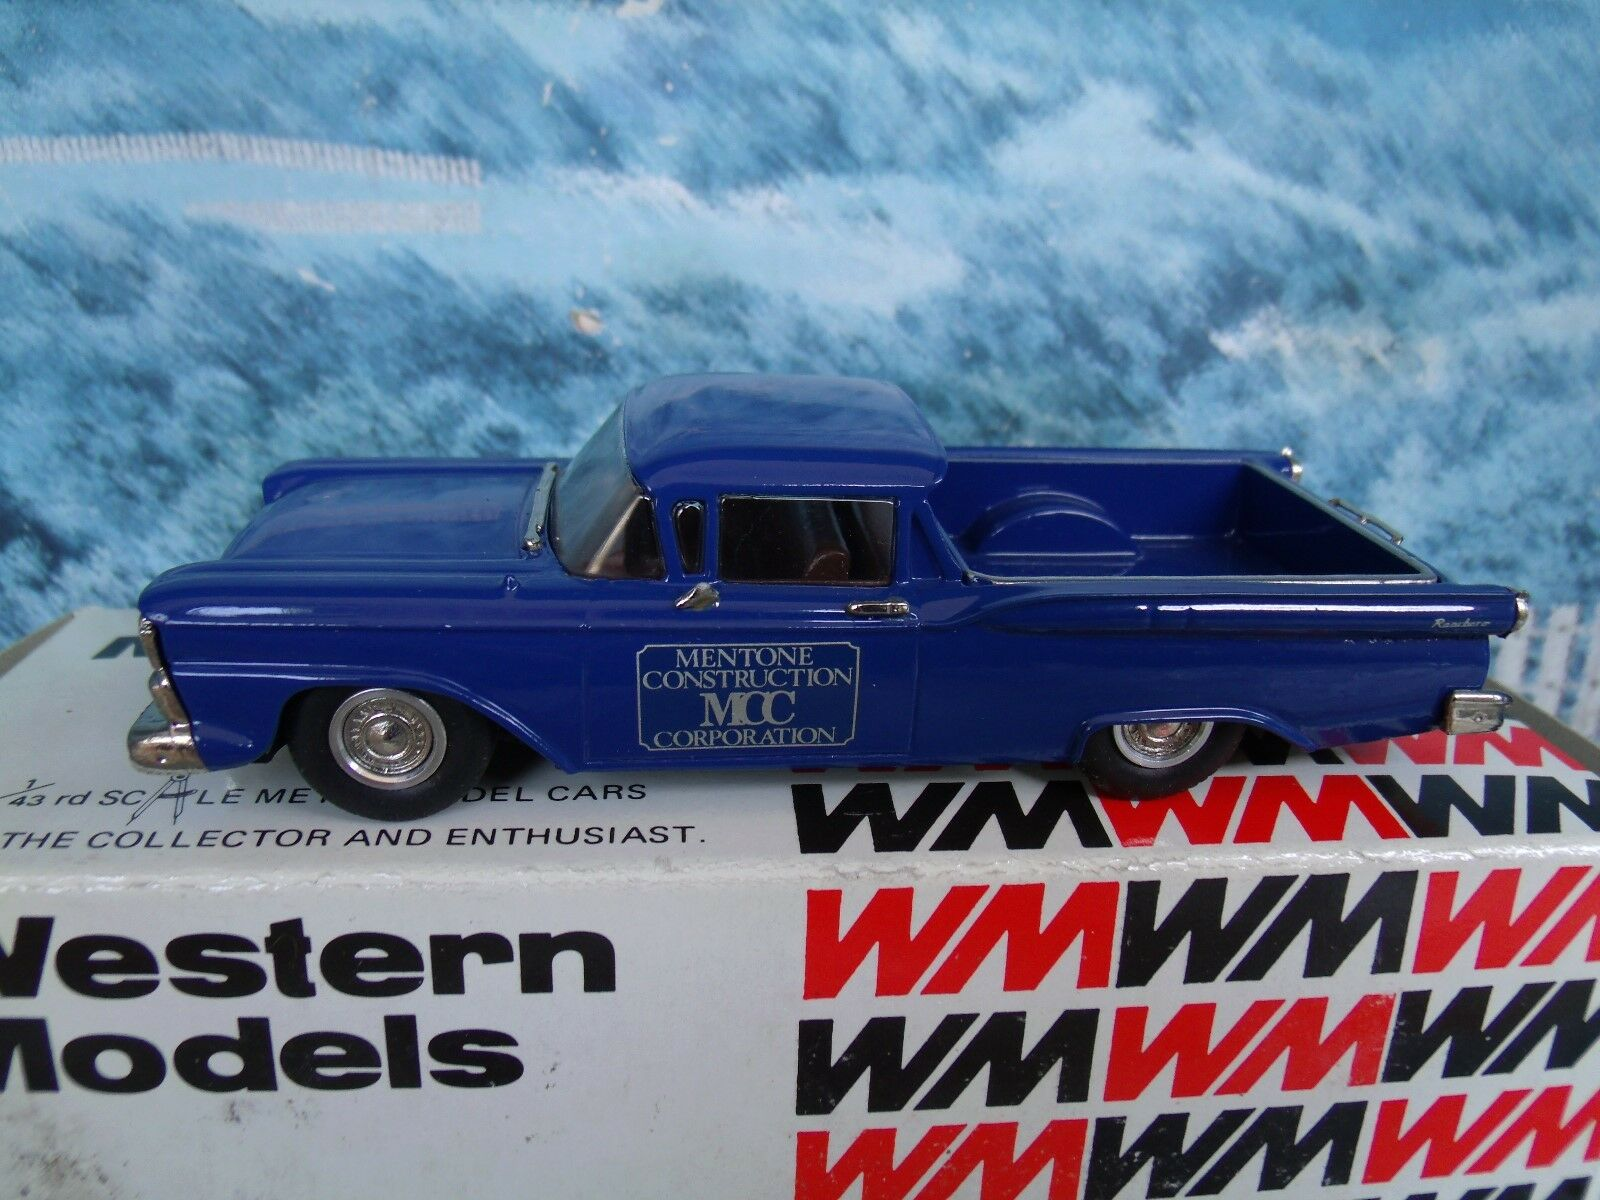 1/43 Western models  (England) 1959 FORD ranchero   white metal WMS53